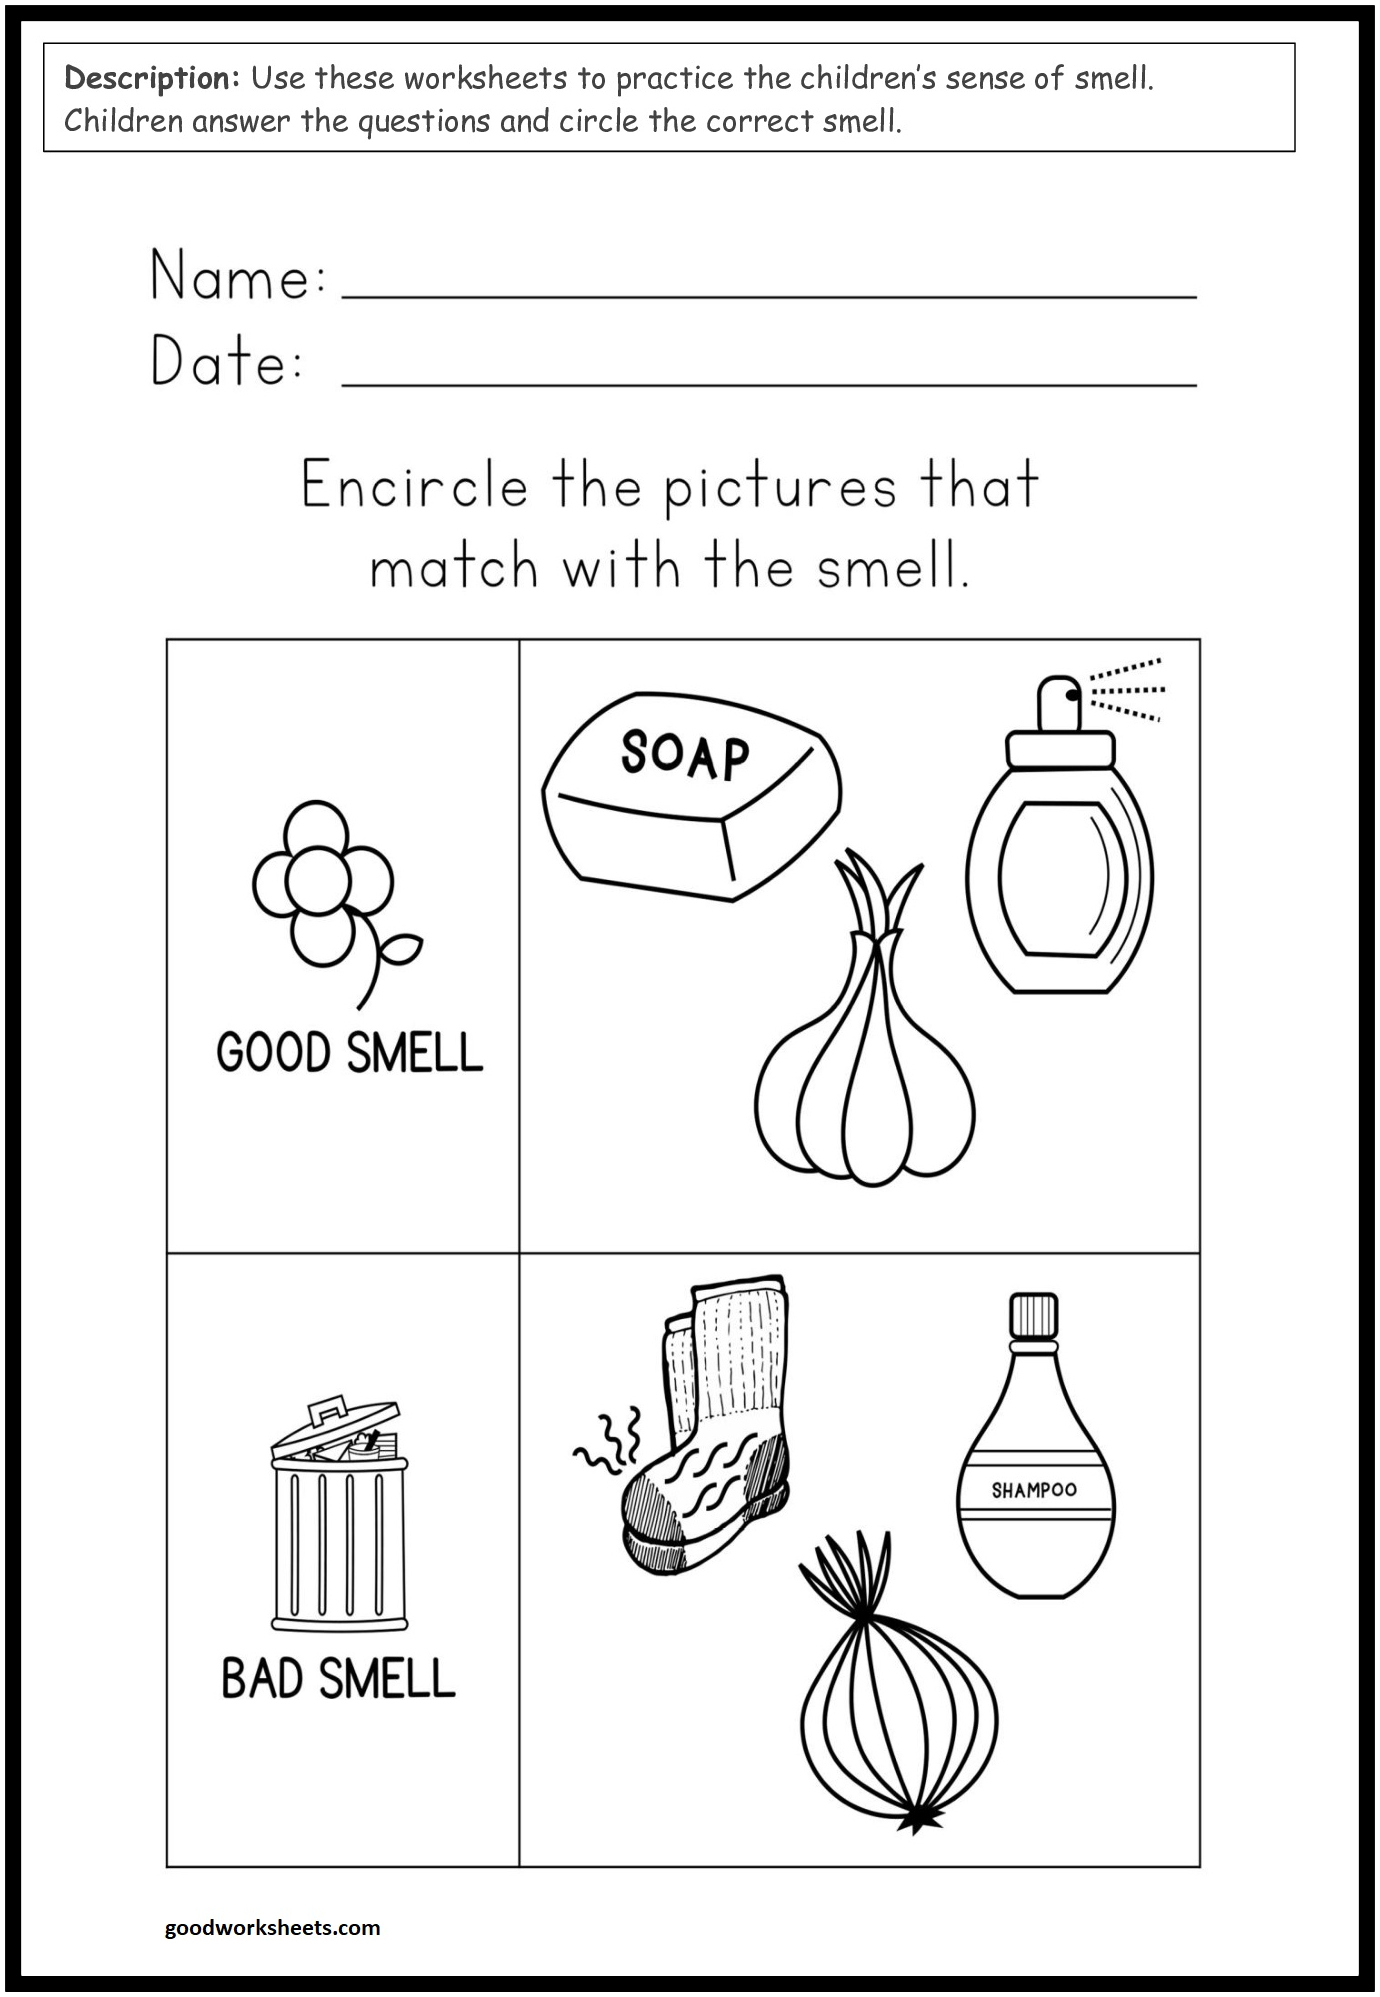 Good And Bad Smell Worksheets For Kindergarten & Preschool